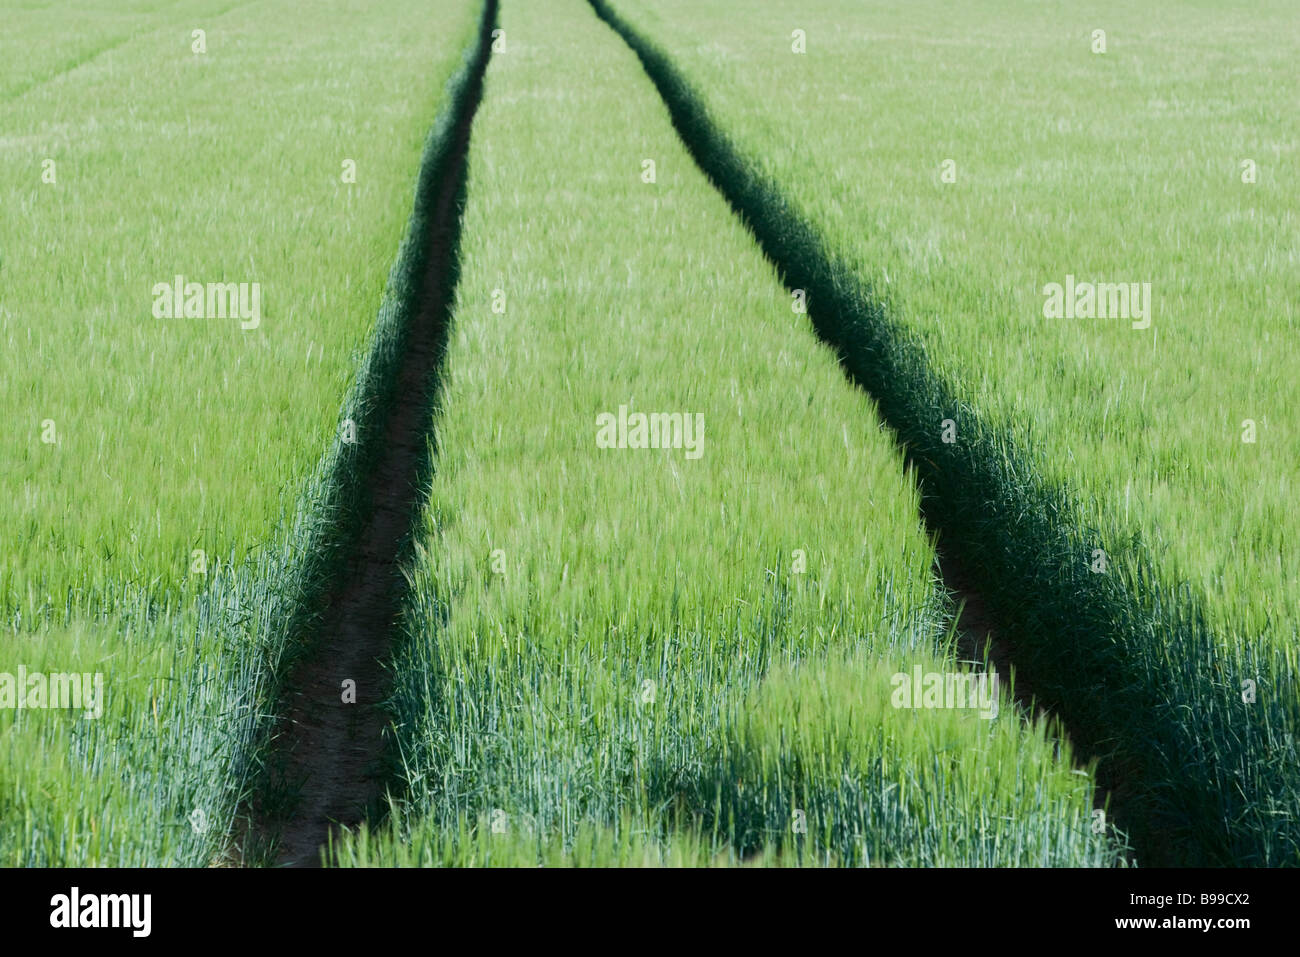 Tracks through wheat field - Stock Image